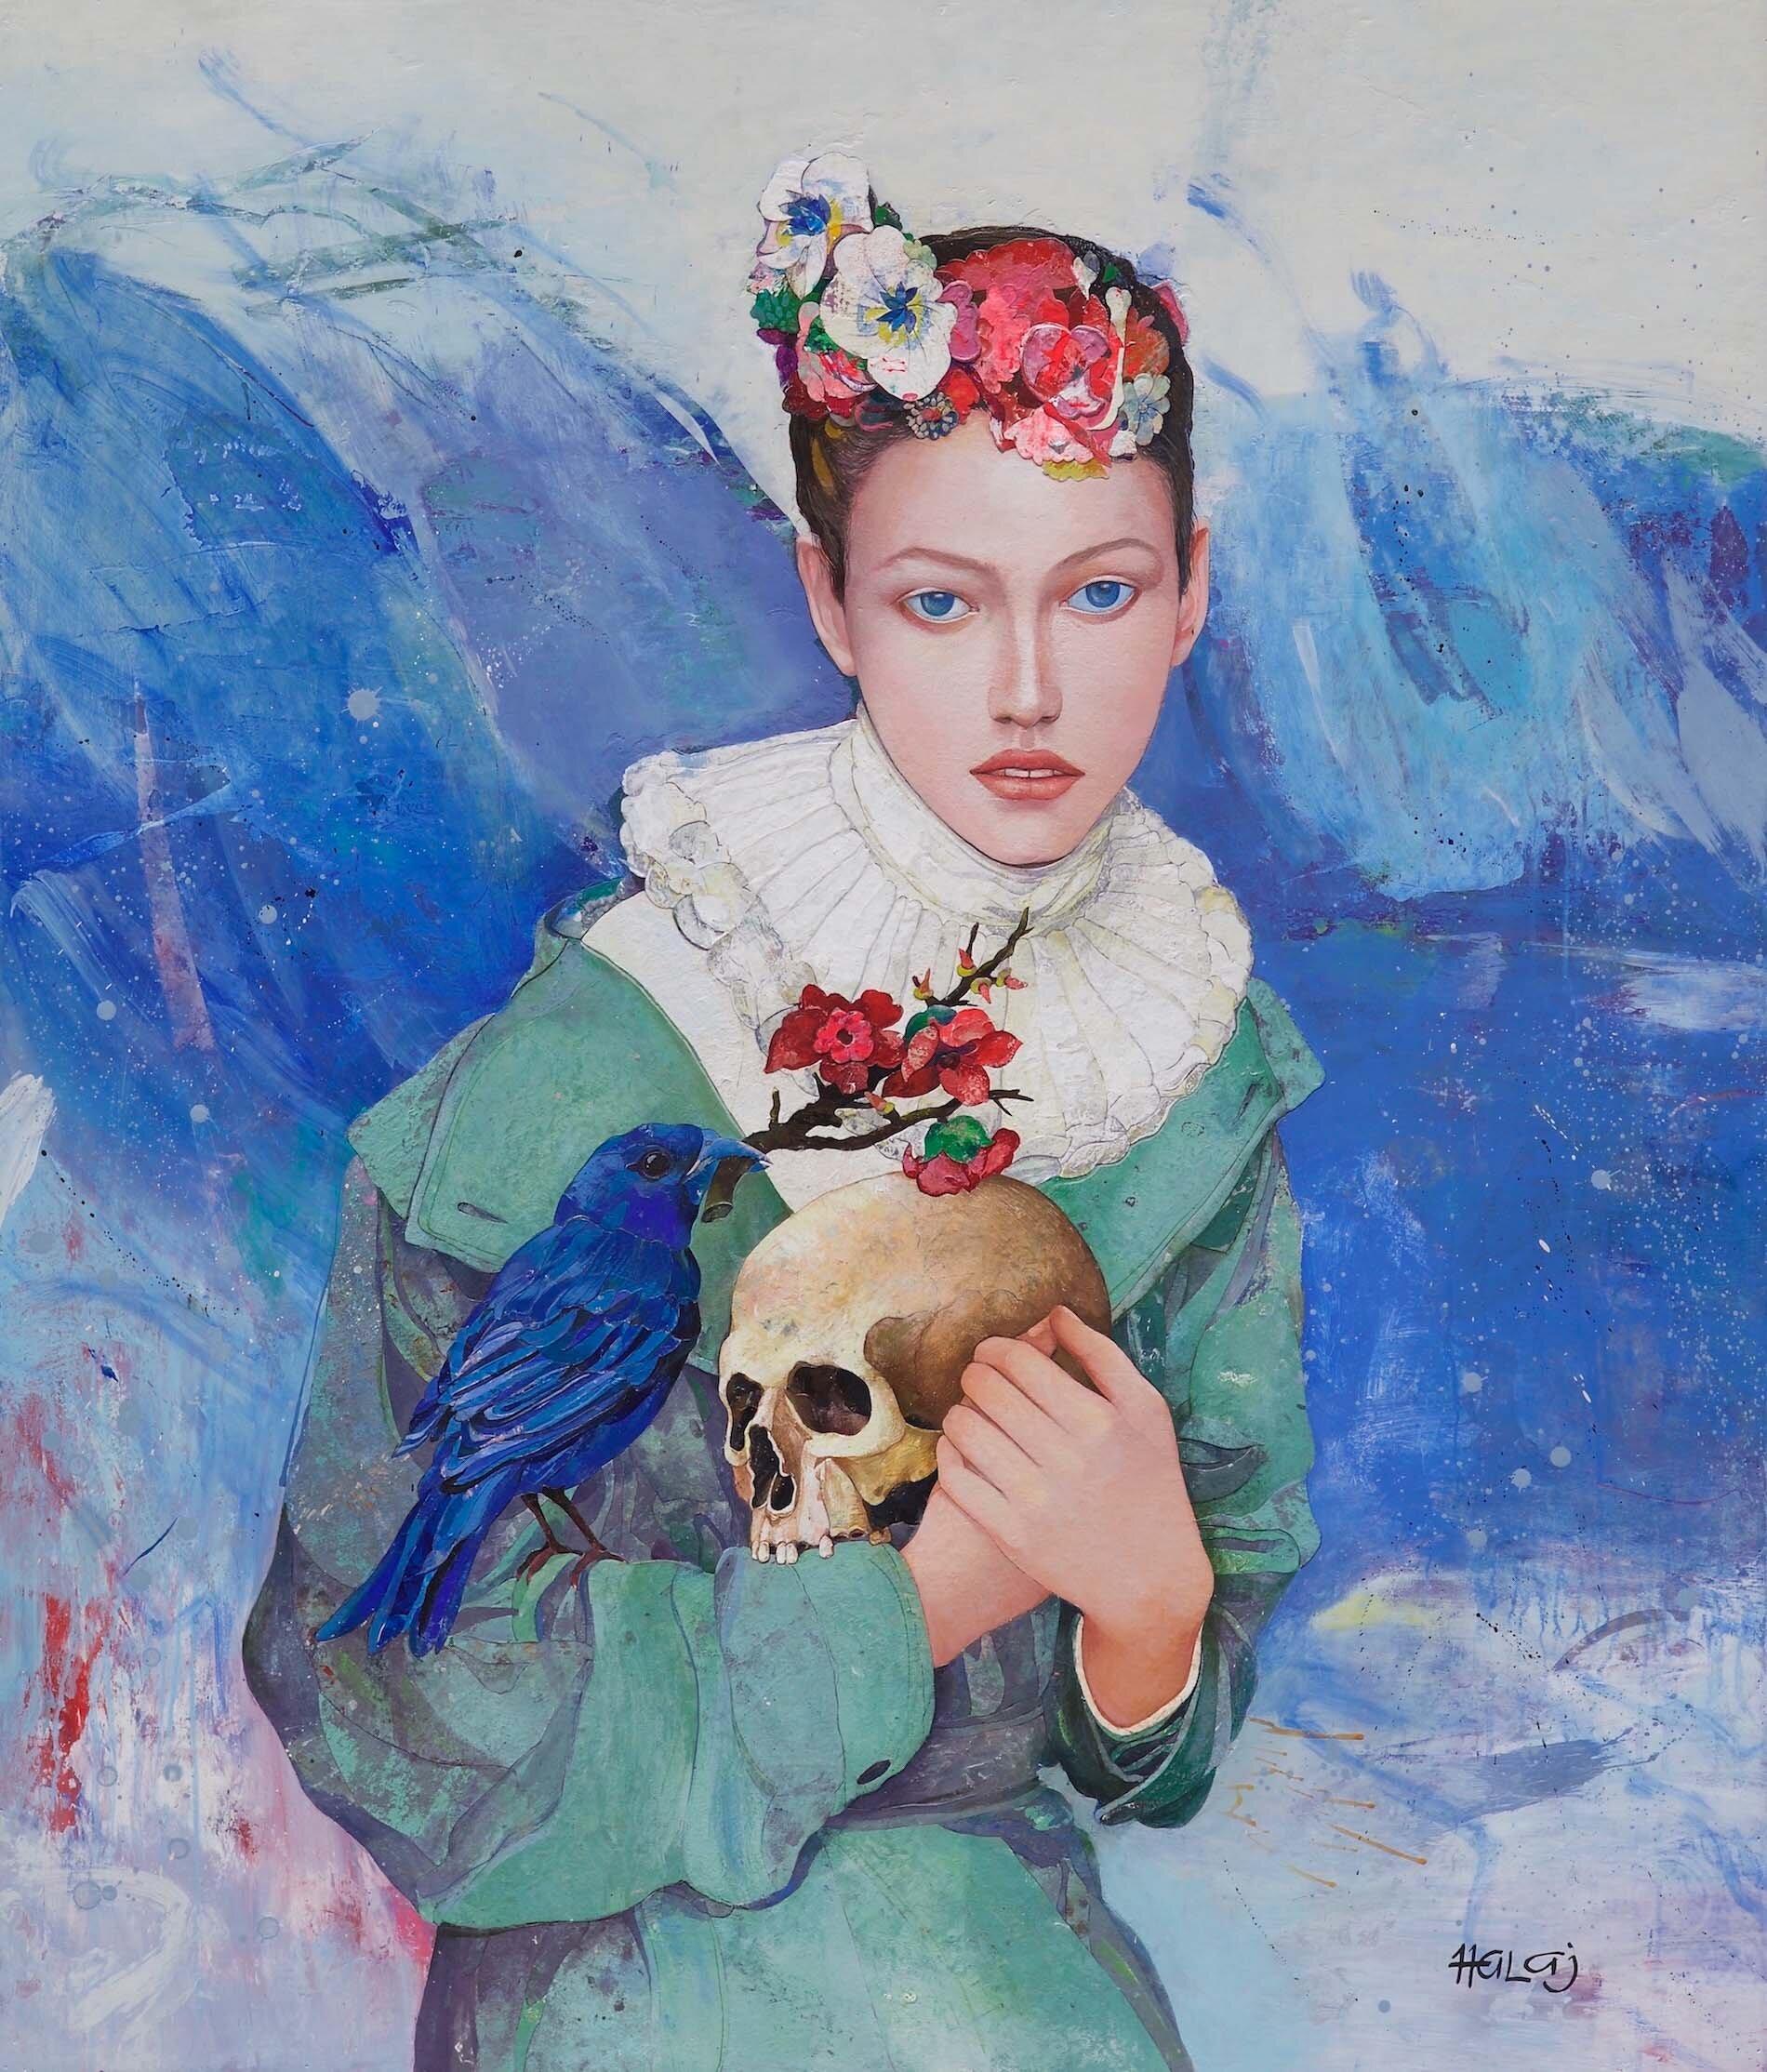 Minas Halaj %22 Blue Bird %22 2017, Oil, wax, textile, mixed media on panel, 54x46 in. (137.16x116.84 cm.).jpg